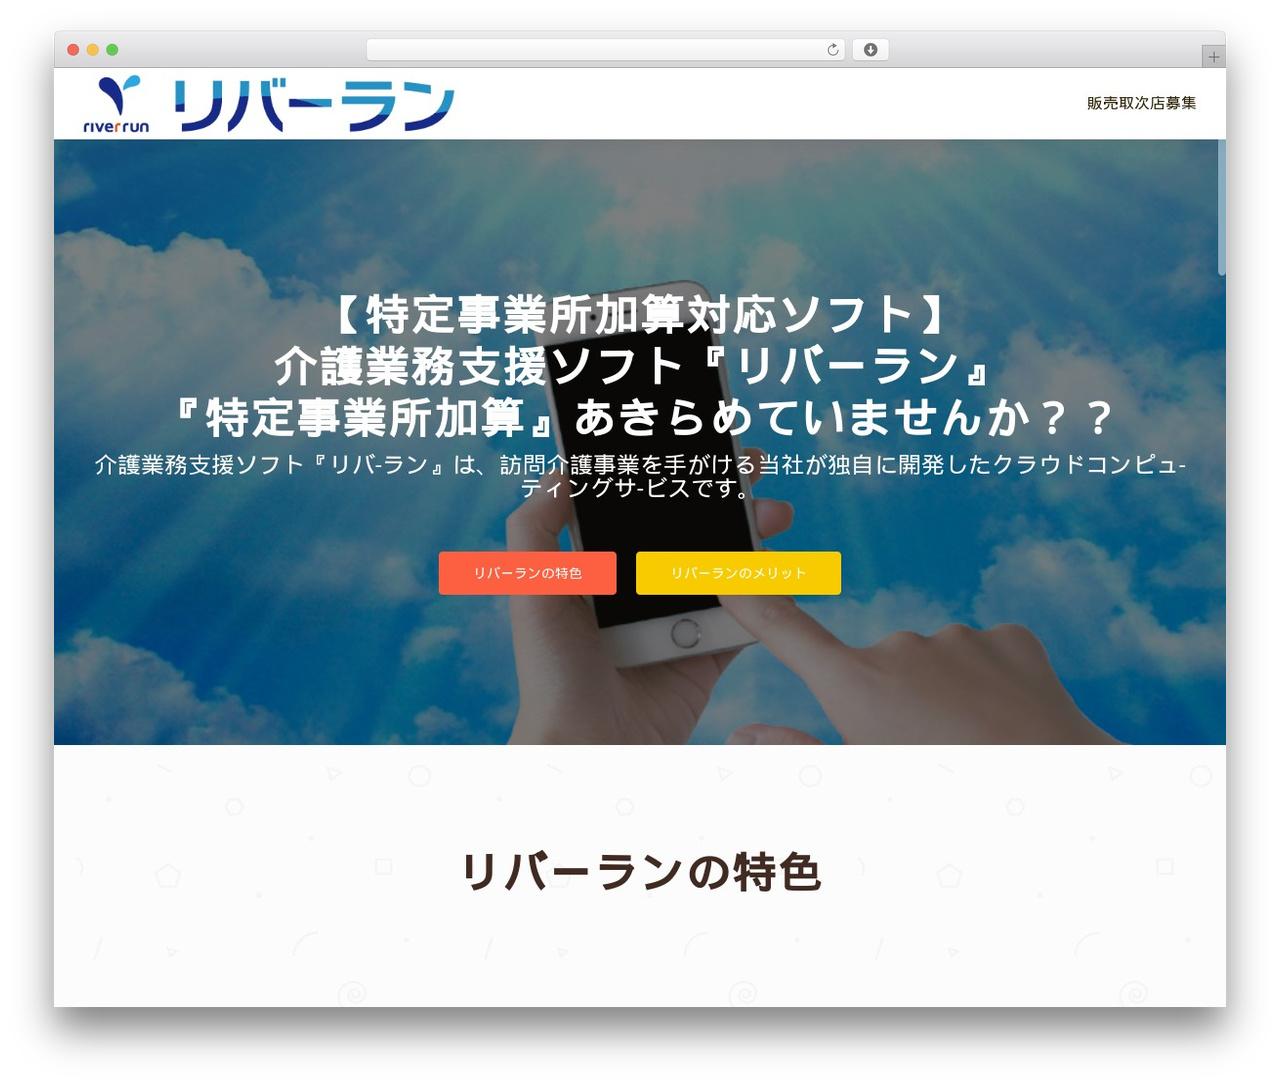 OnePirate template WordPress free - river-run.biz